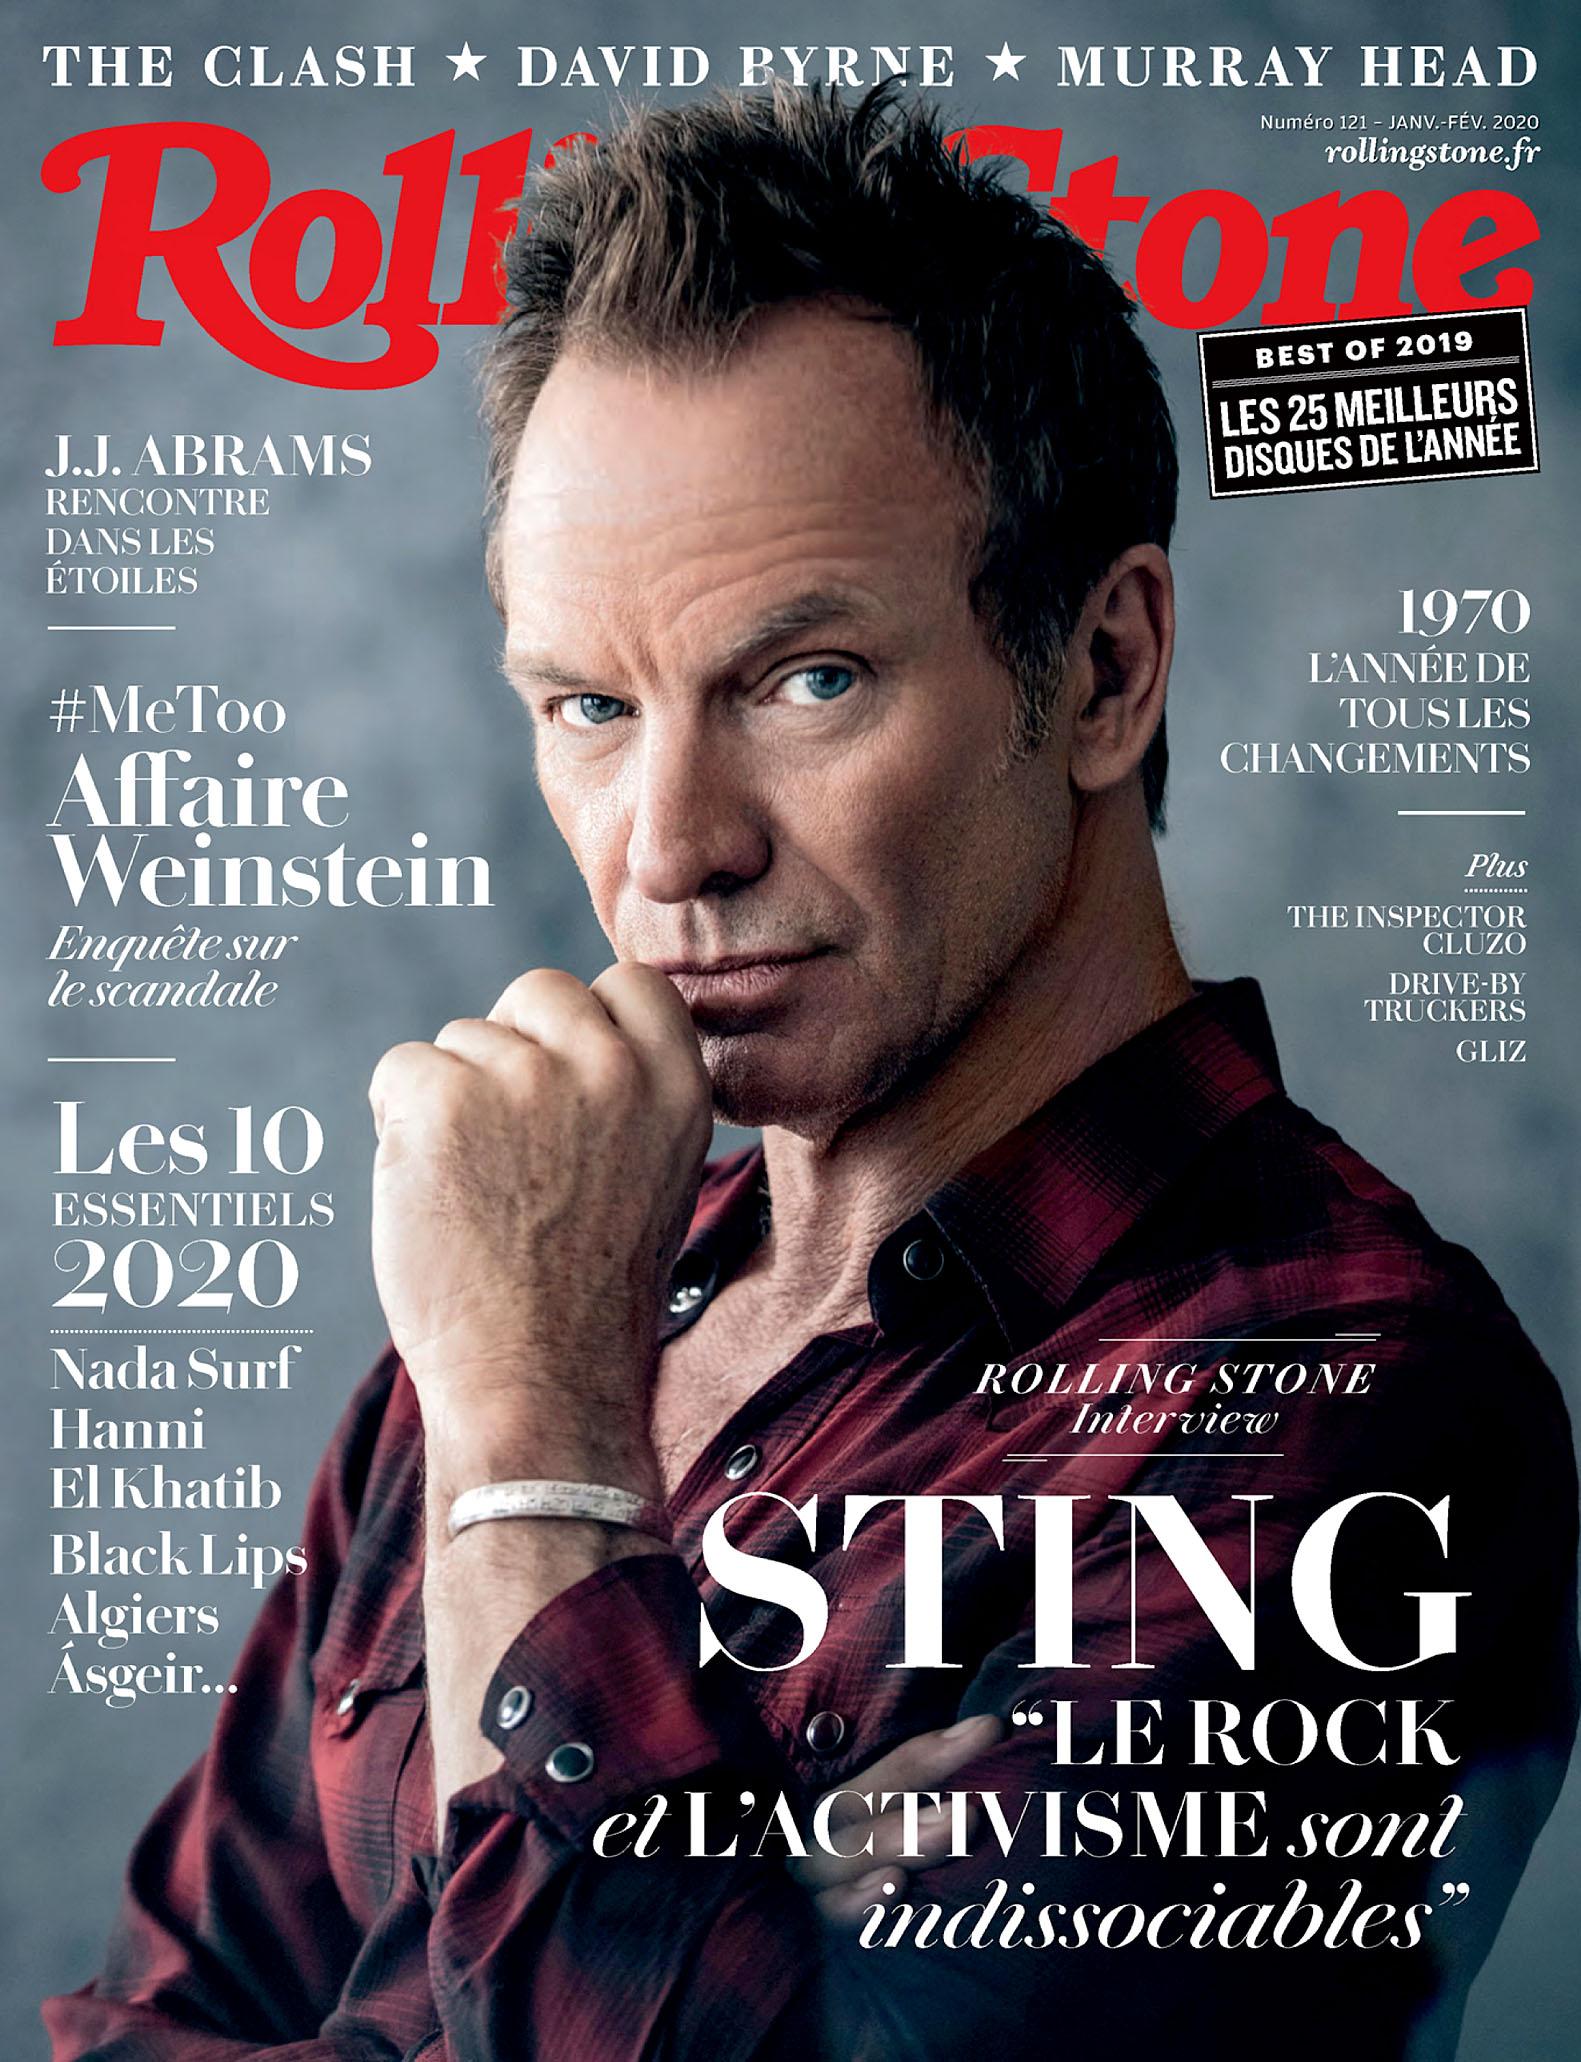 Rolling Stone Fr 2020-01-02 Sting 01.jpg